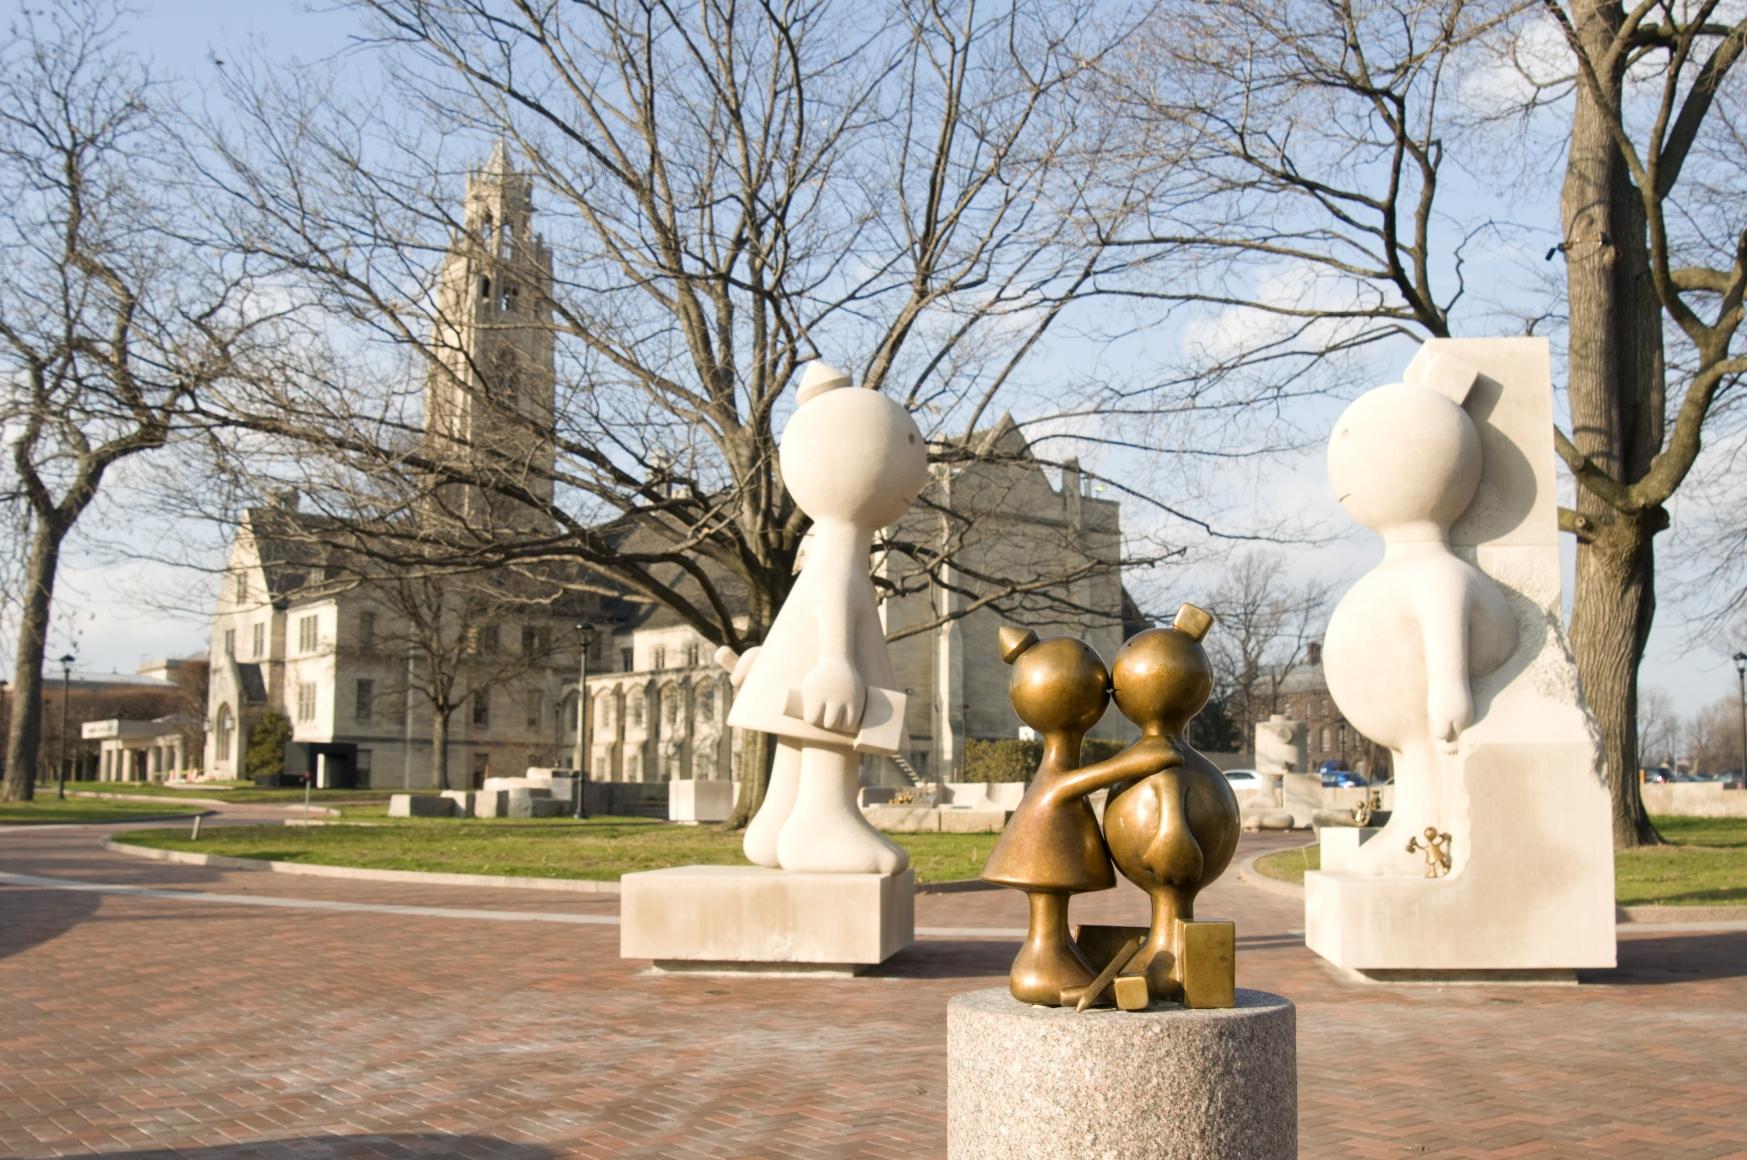 Sculpture, Statue, Art, Architecture